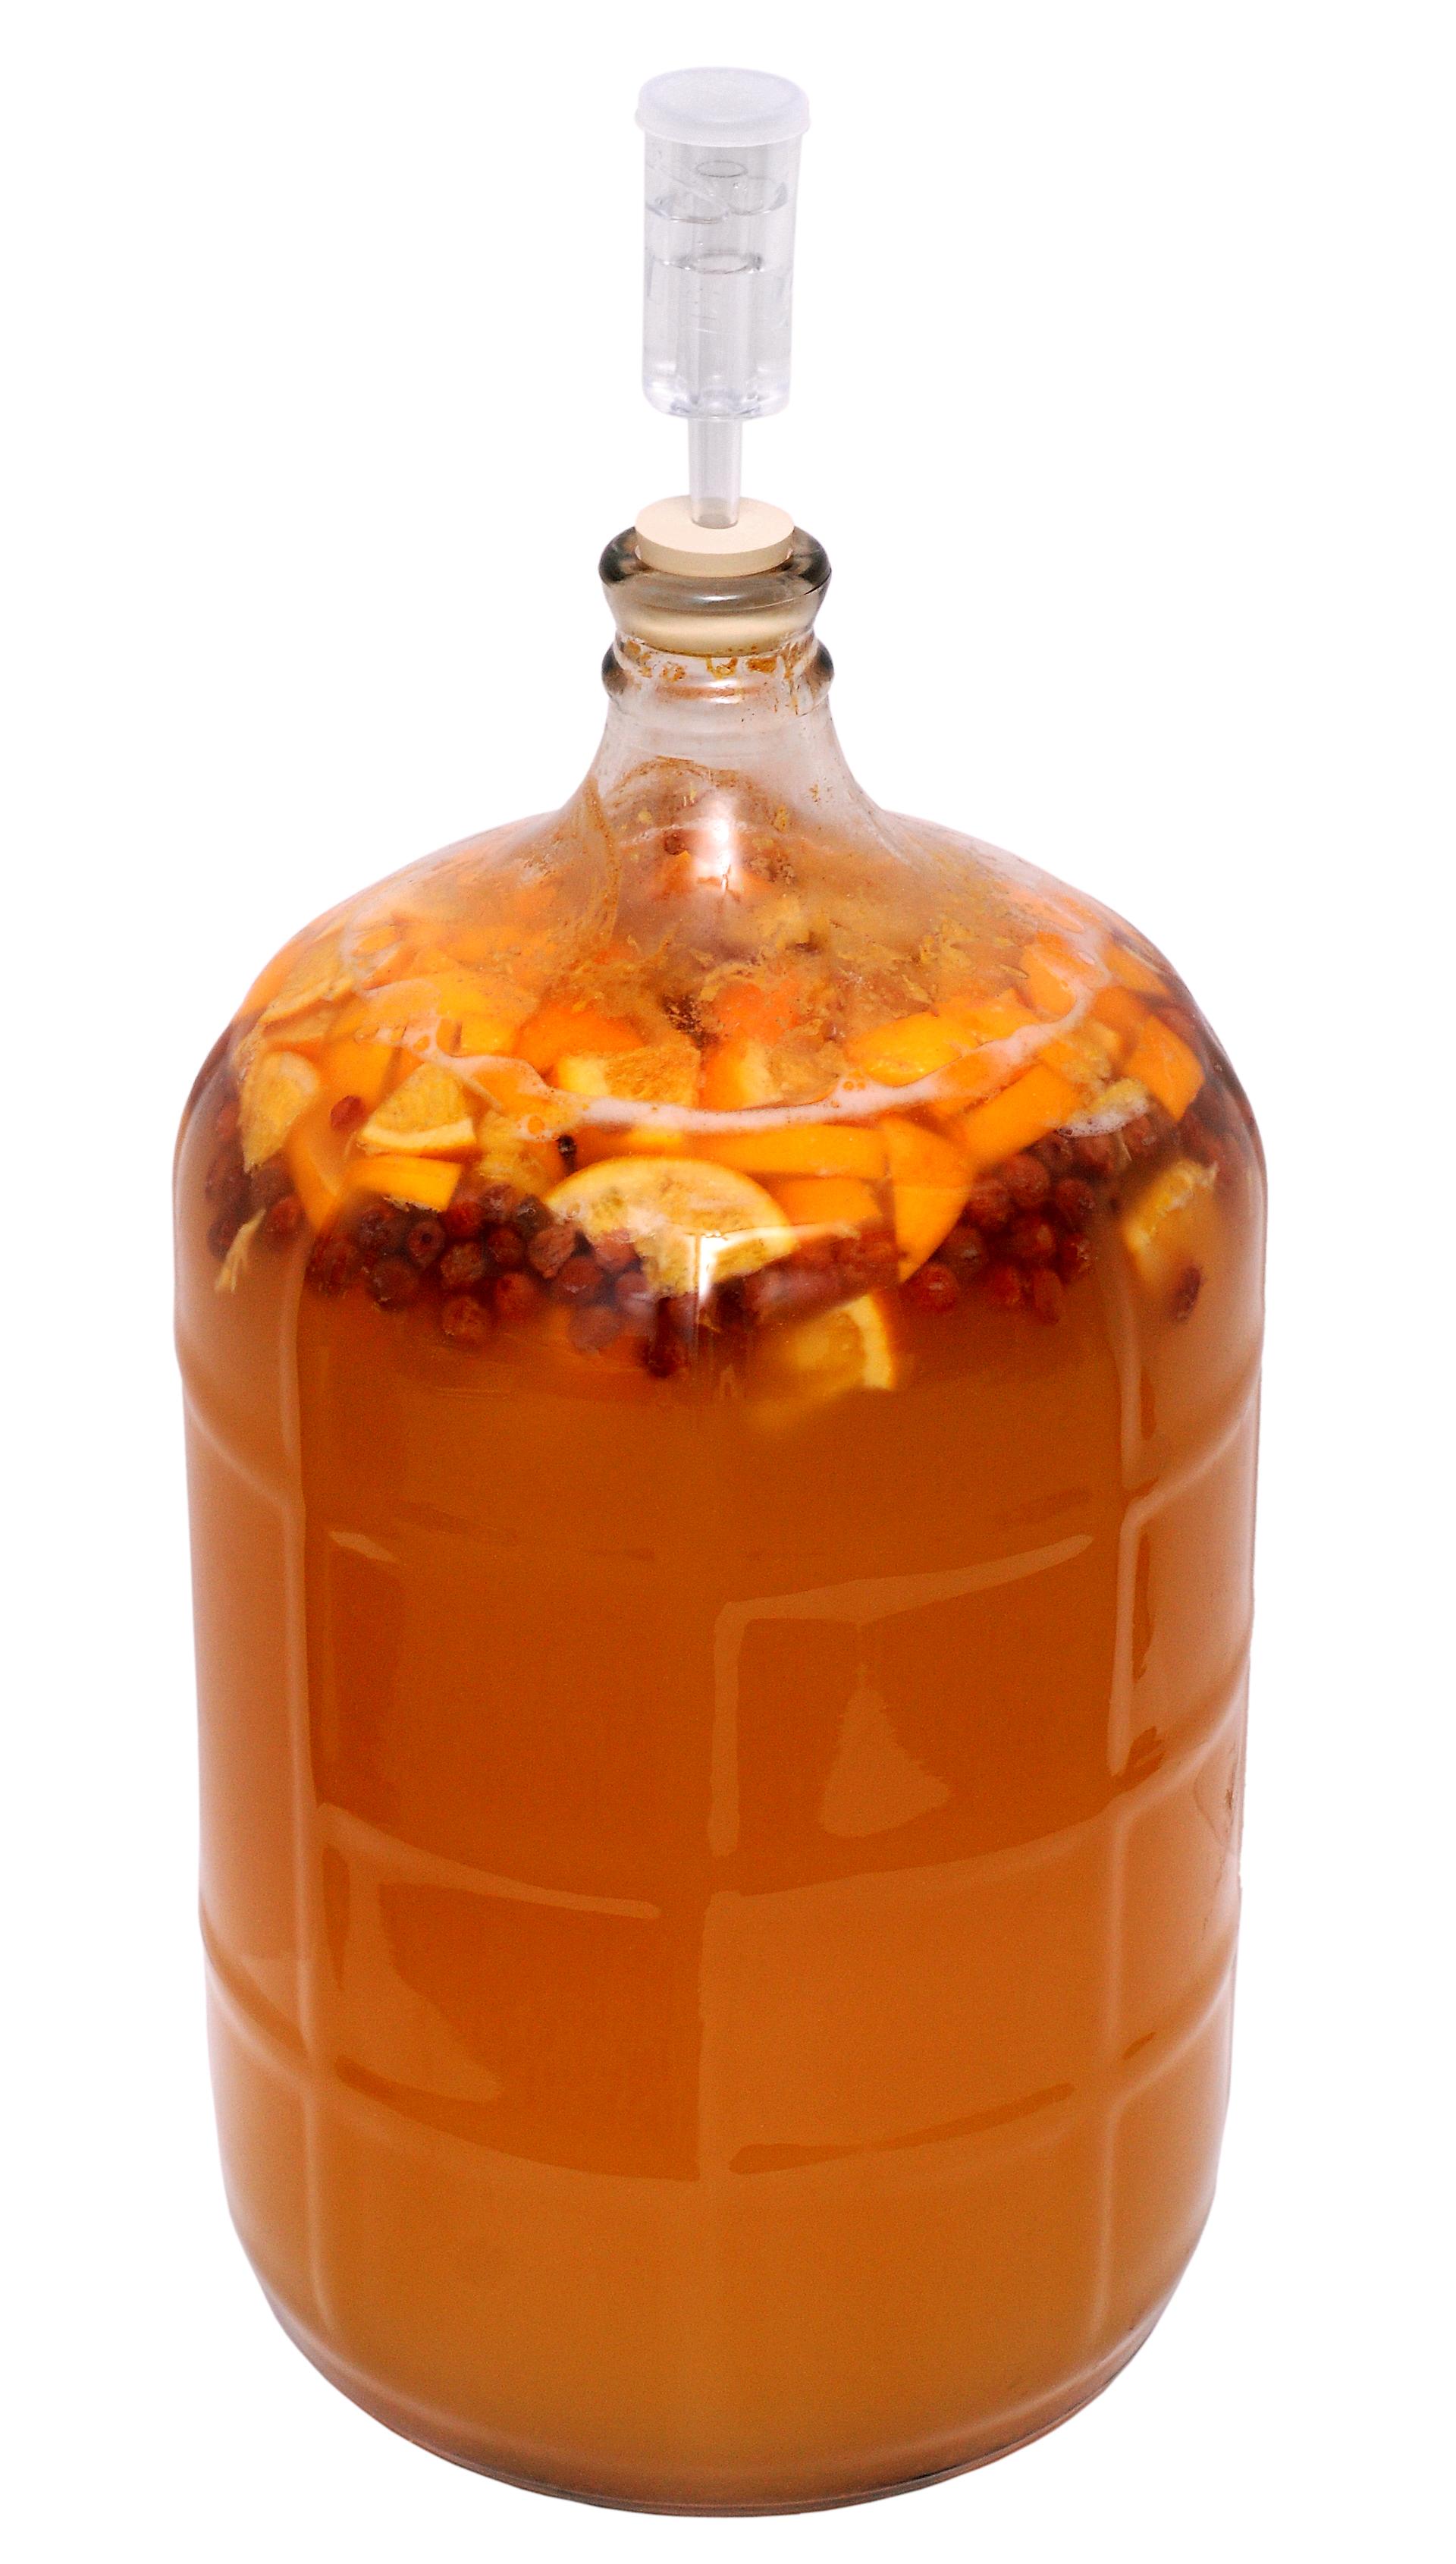 File:Honey-Fruit-Mead-Brewing.jpg - Wikipedia, the free encyclopedia